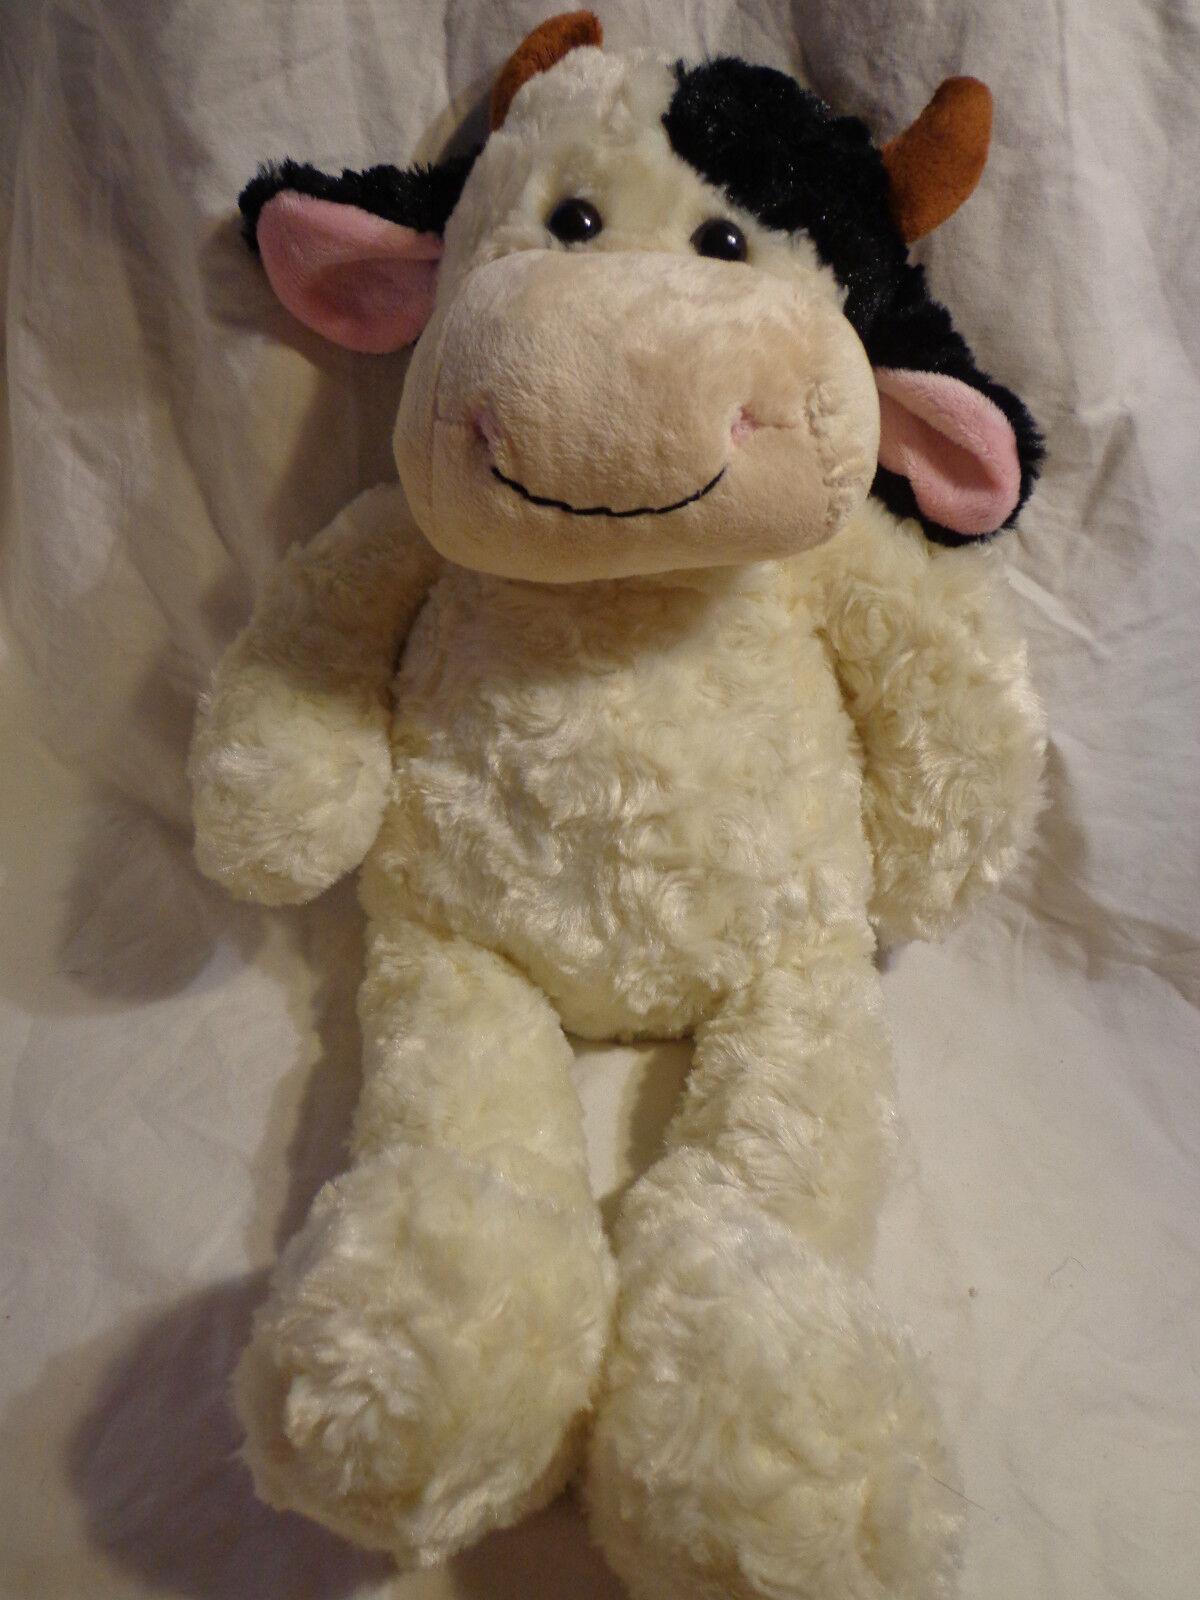 20  Dairy Cow Bull Whimsical Happy Bull Plush Super Soft Toy Stuffed Animal